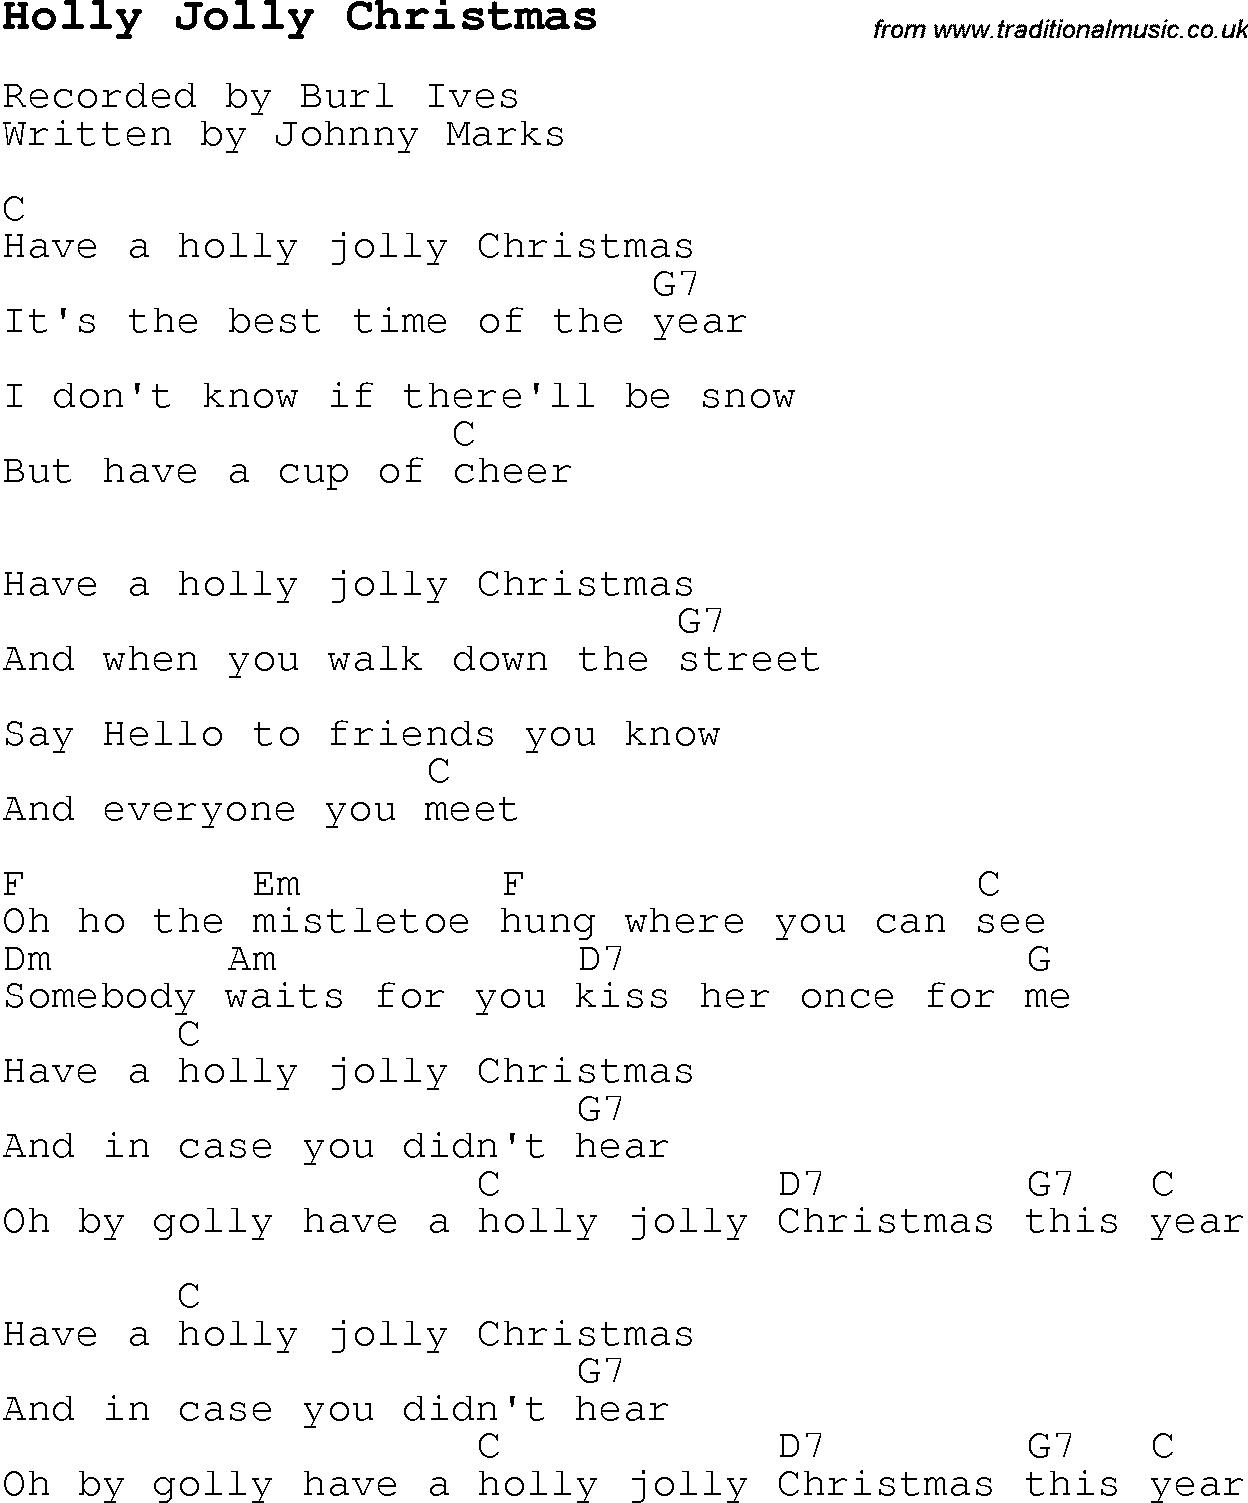 christmas songs and carols lyrics with chords for guitar banjo for holly jolly christmas - Christmas Songs Ukulele